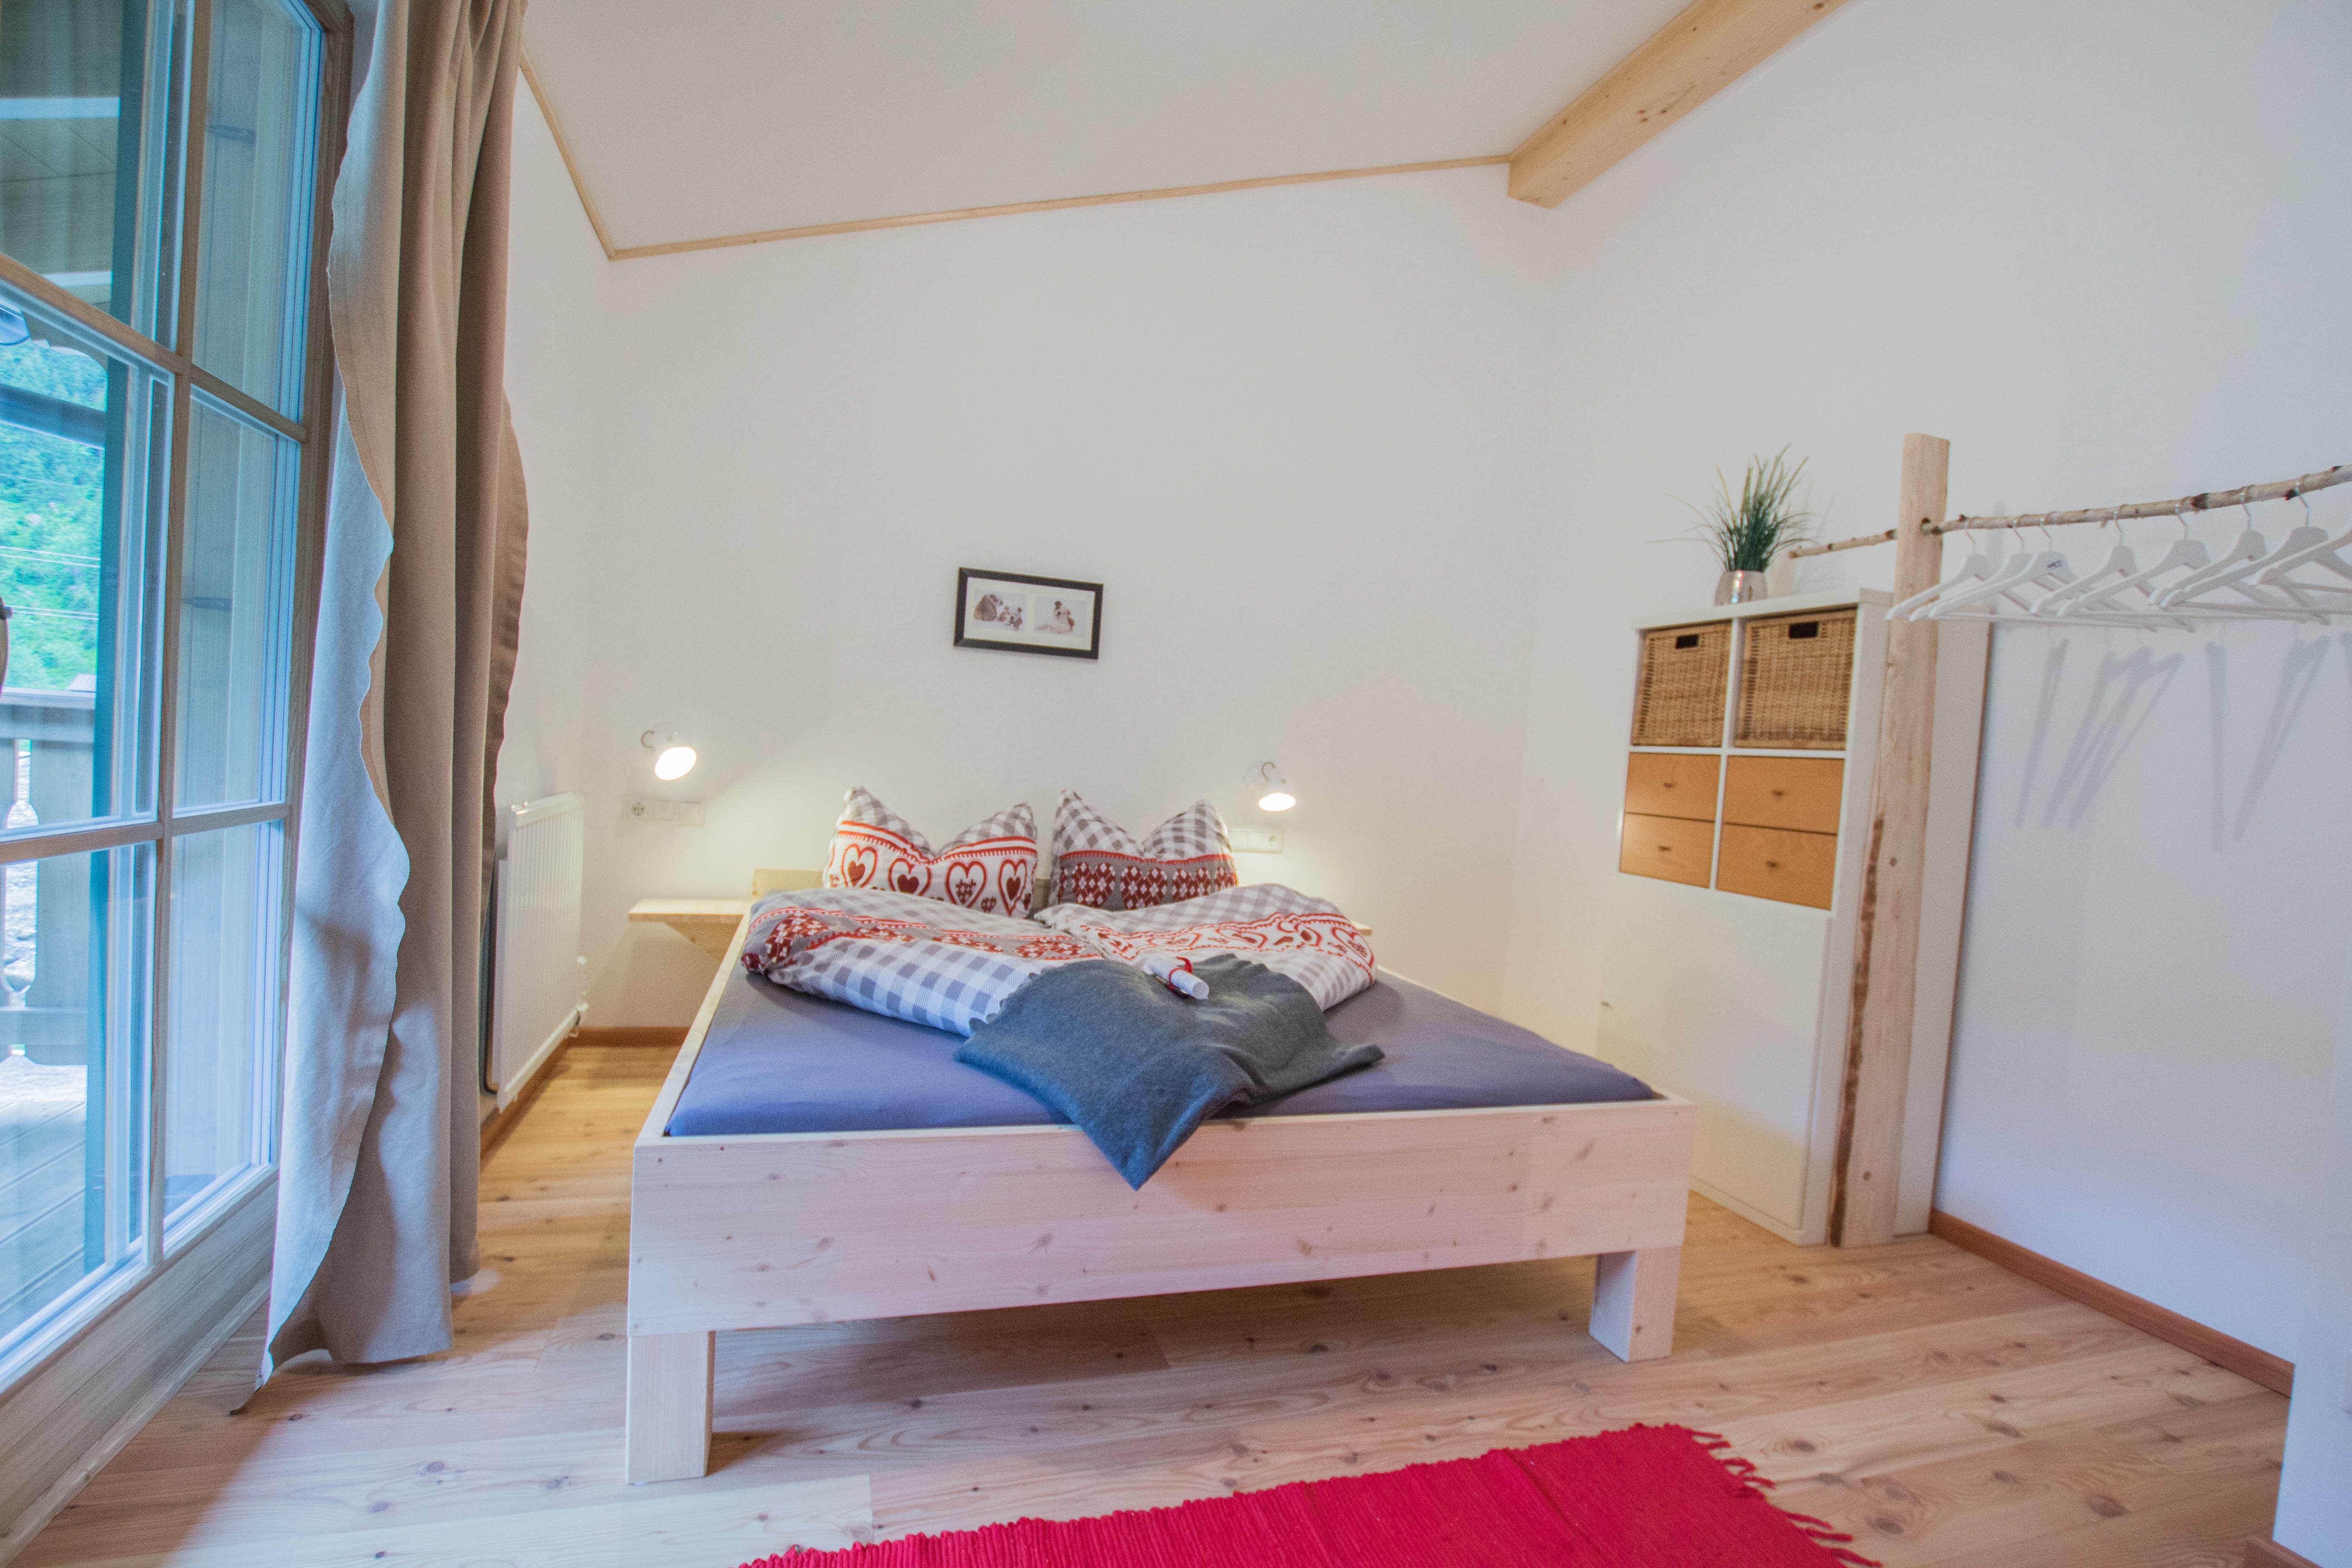 Maison de vacances Lodge Kleiner Bär direkt am Skilift (2050394), Uttendorf, Pinzgau, Salzbourg, Autriche, image 9